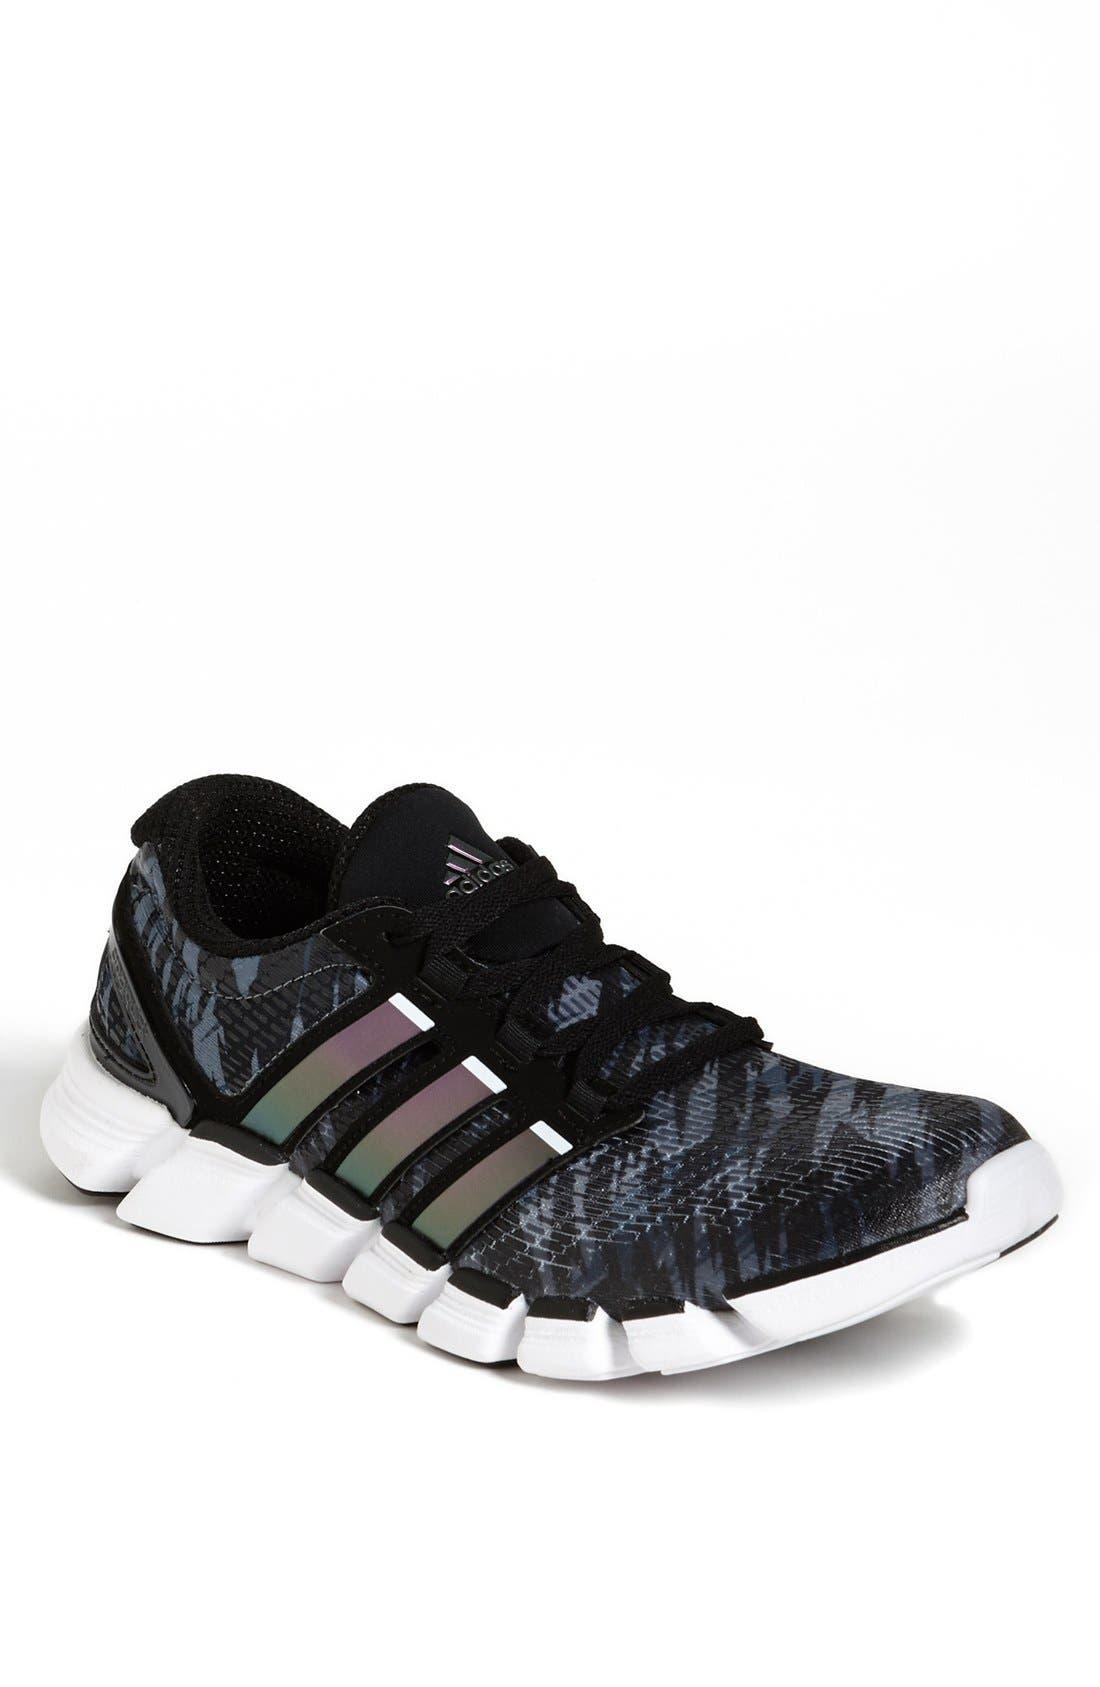 Main Image - adidas 'adiPure CrazyQuick' Running Shoe (Men)